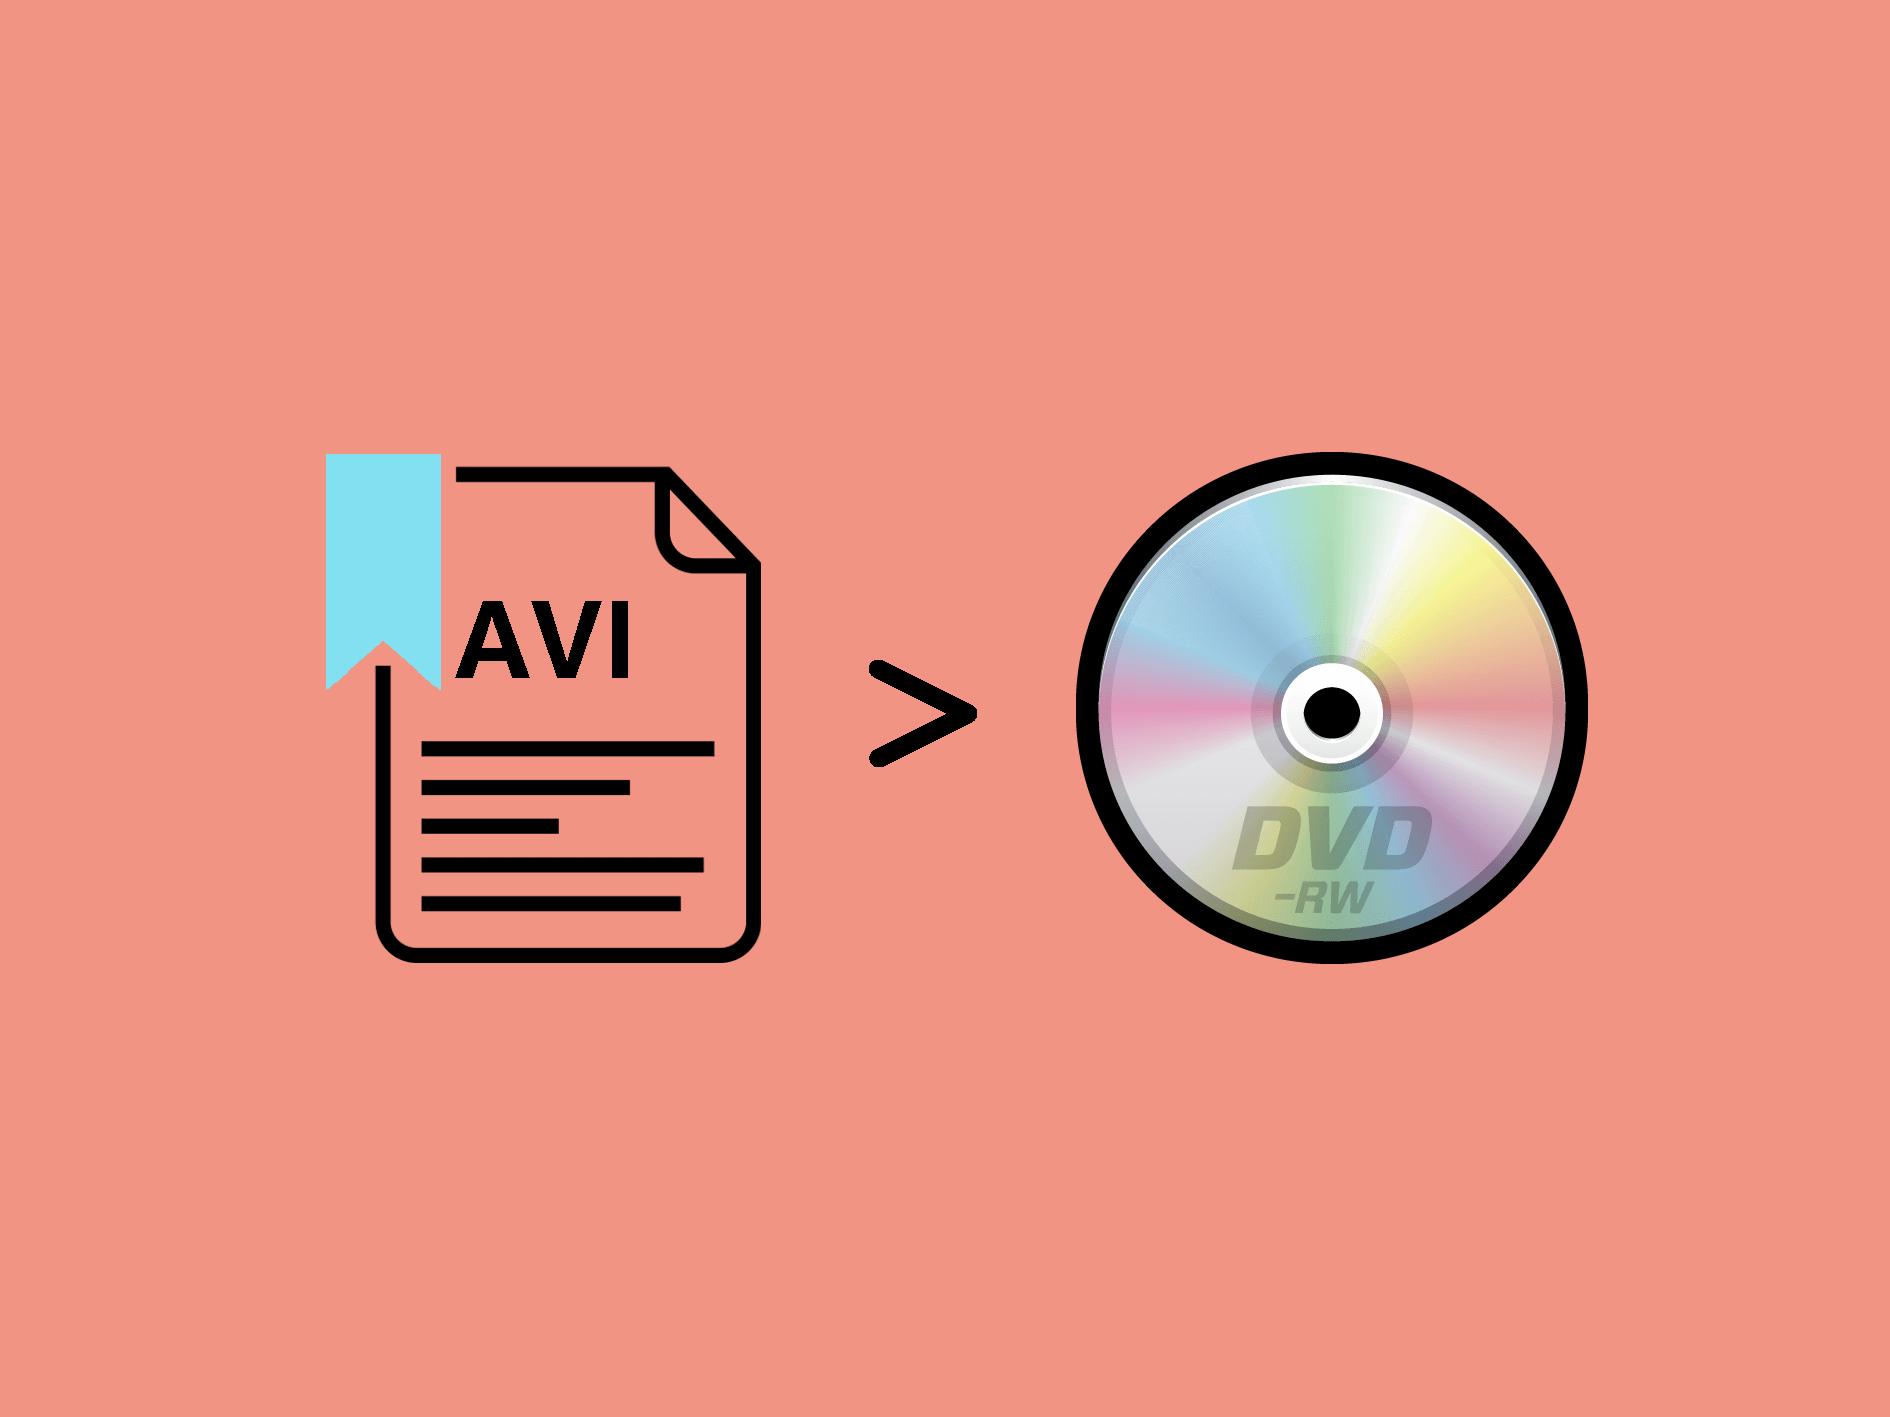 AVI動画をDVDに書き込む方法